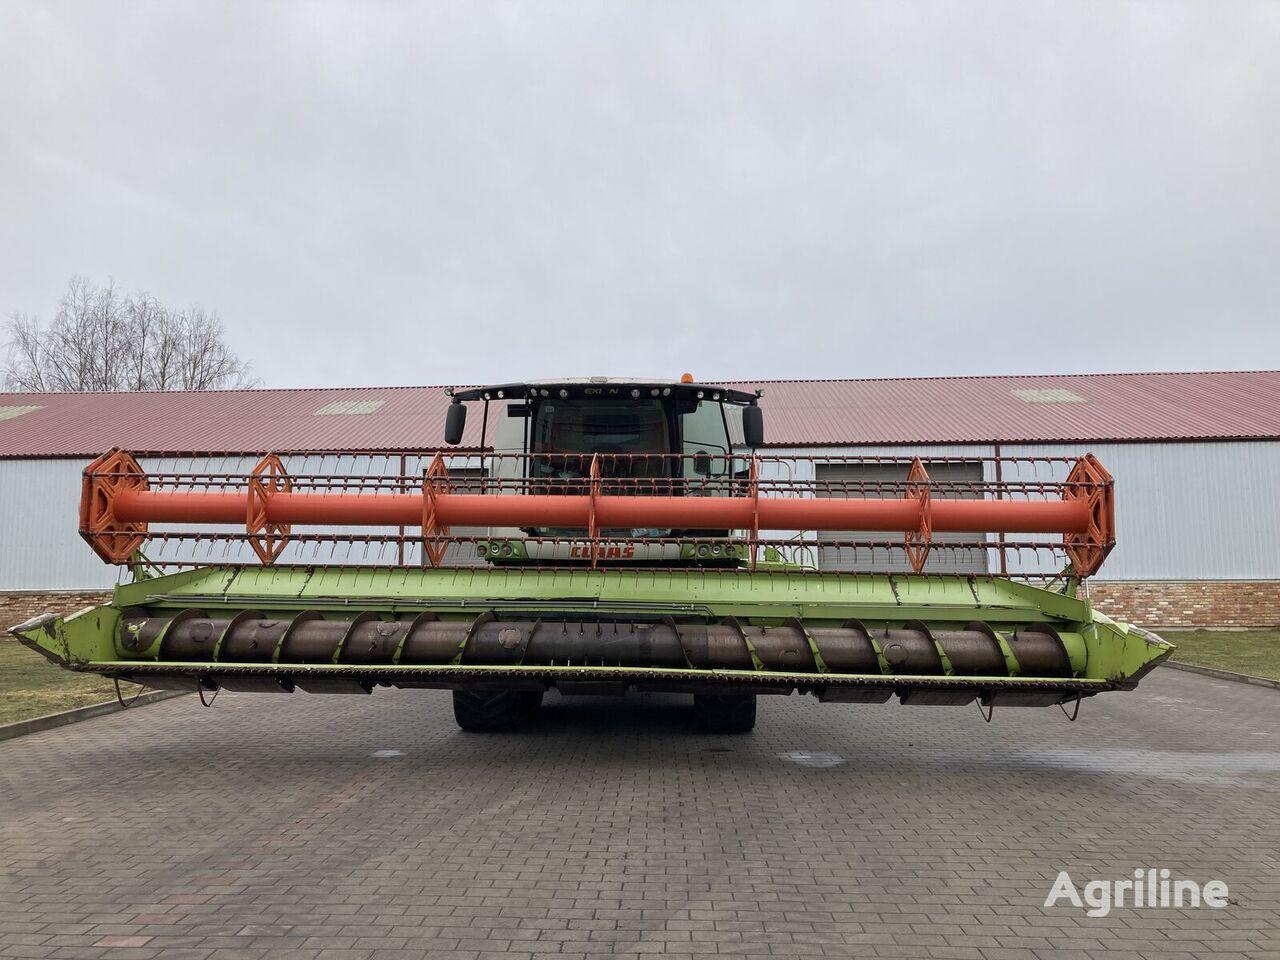 CLAAS Lexion 750TT grain harvester